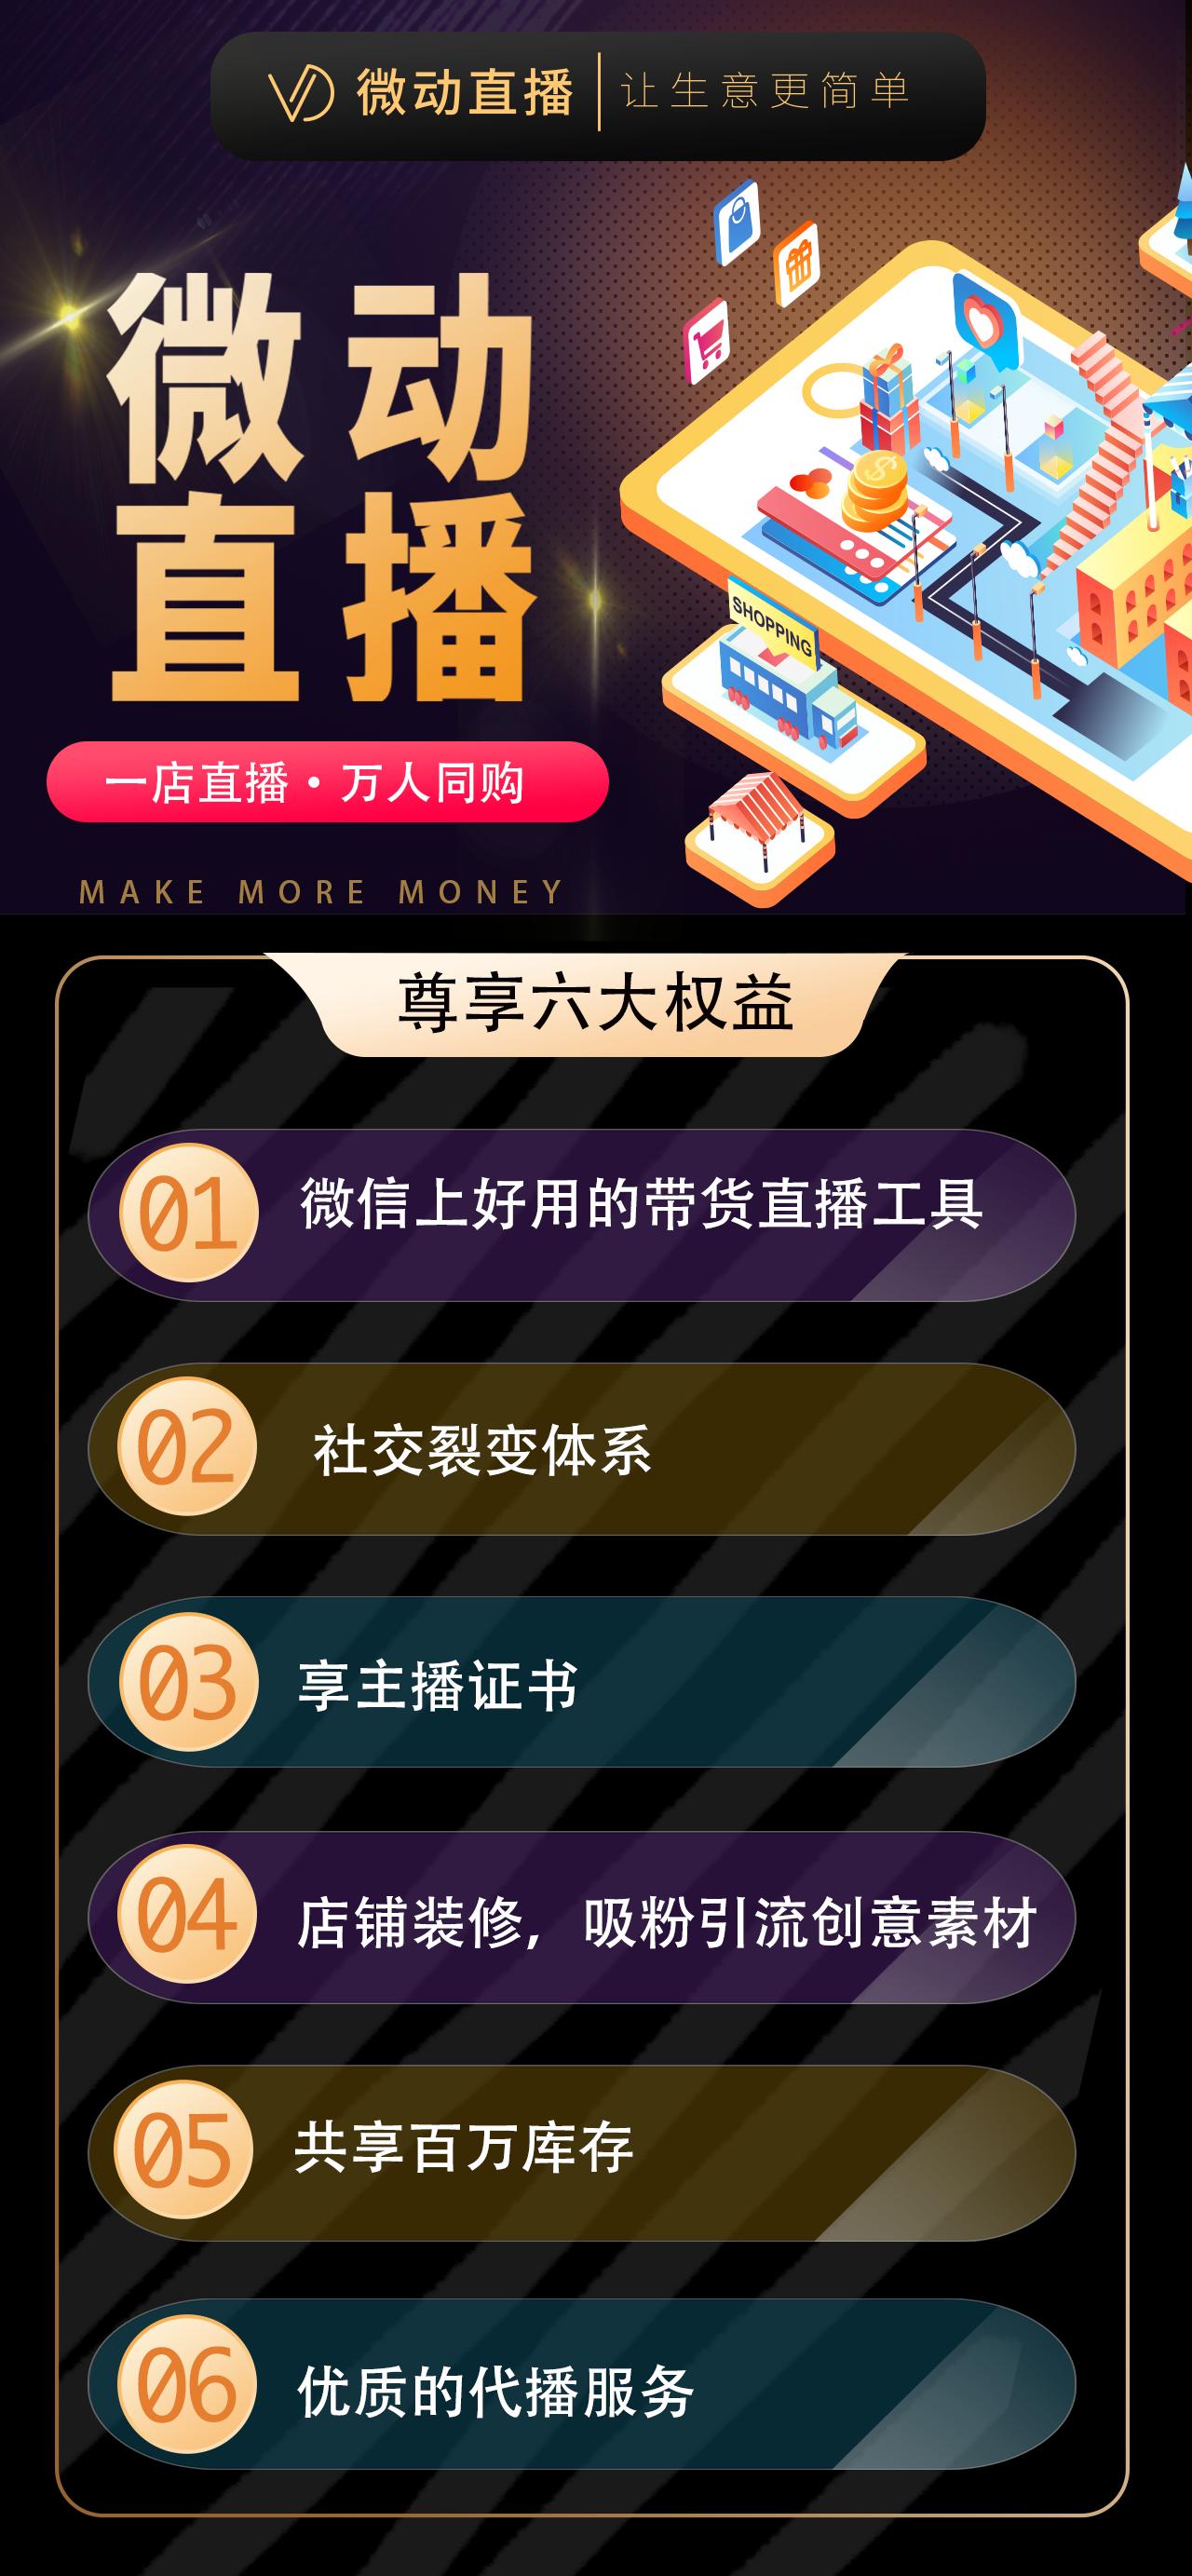 http://www.feizekeji.com/dianxin/437944.html